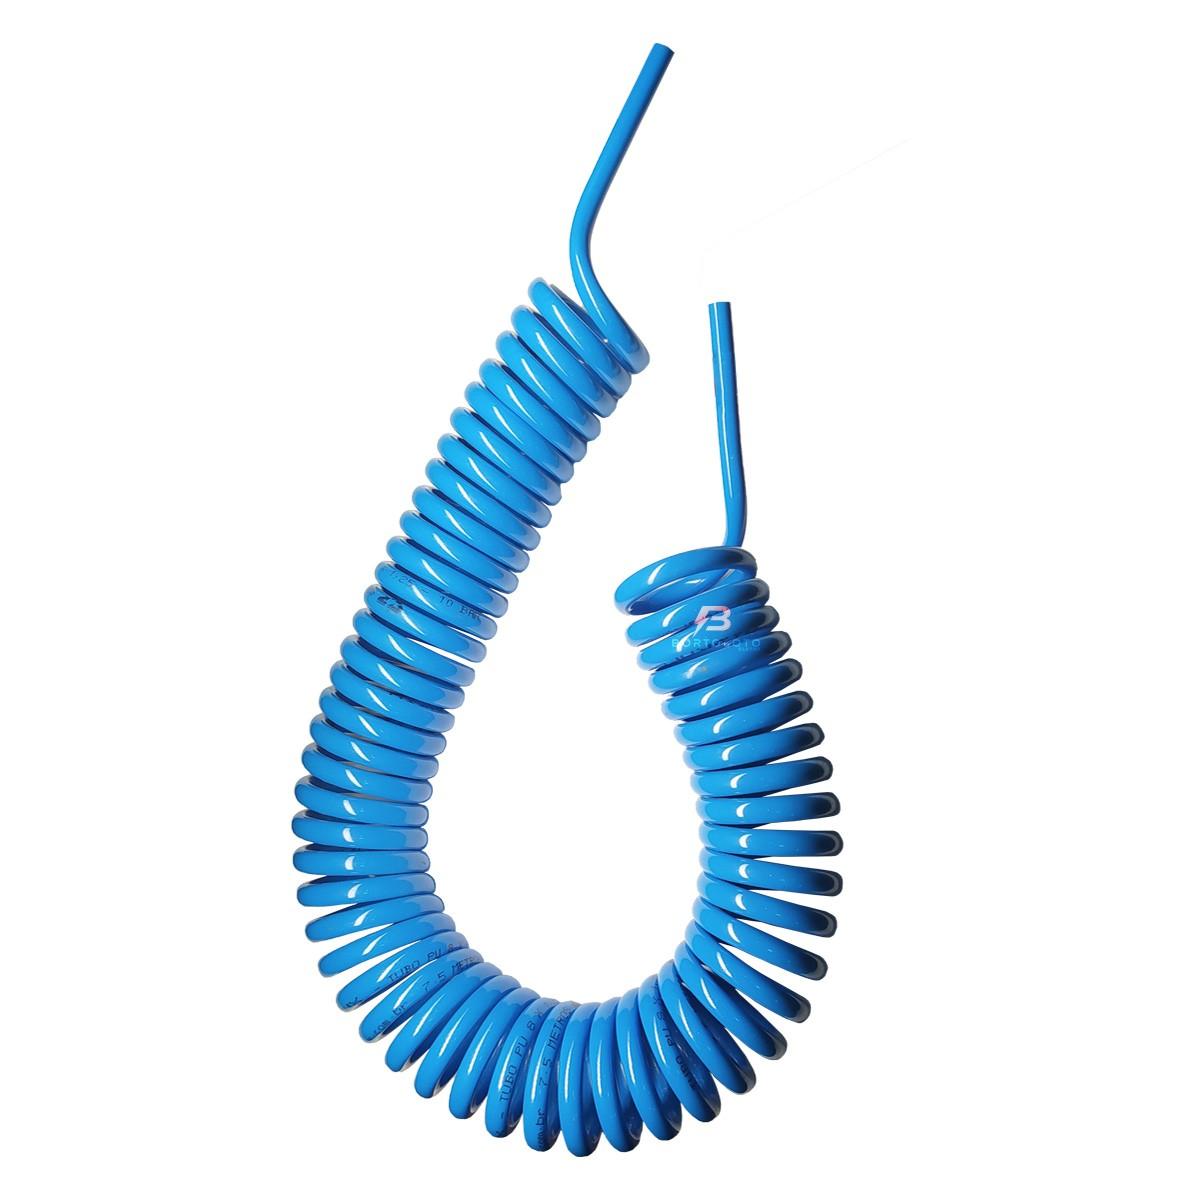 Conector Engate Rapido Mangueira Espiral 10m Pu Kit 5 Peças